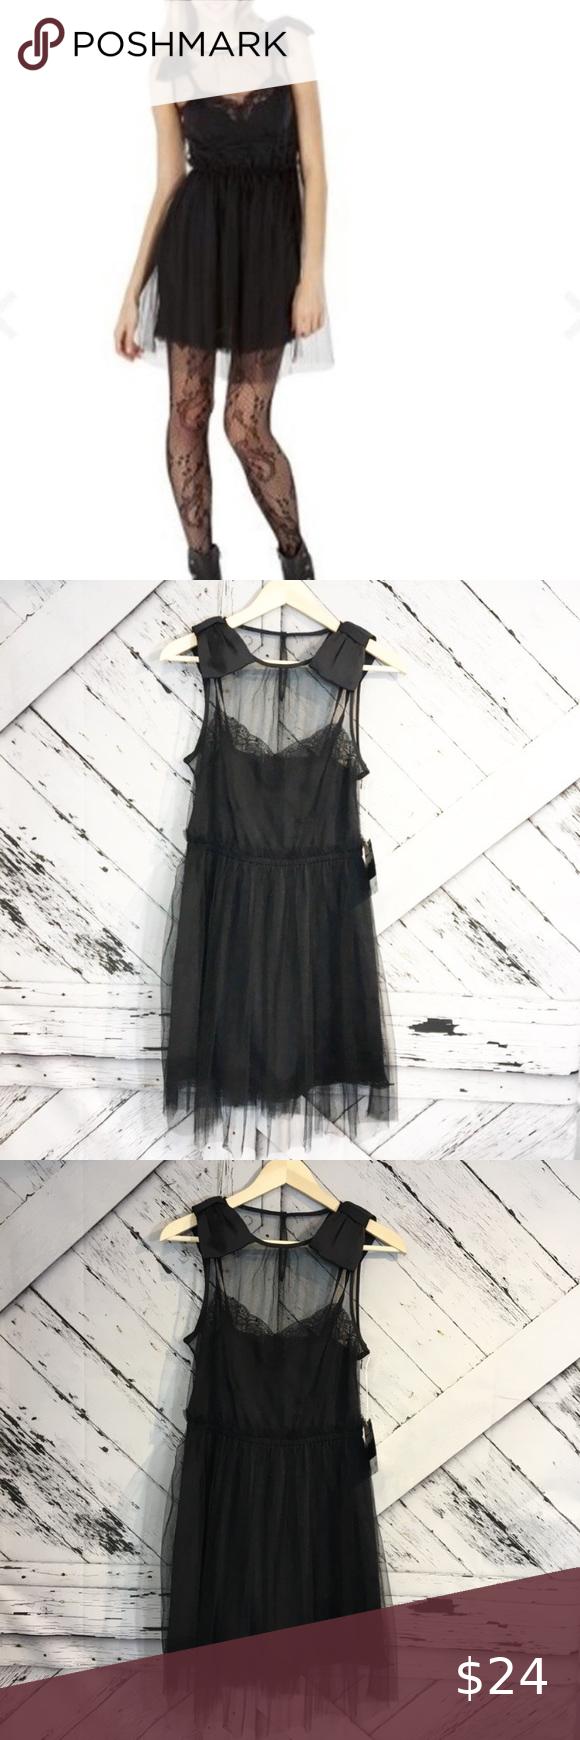 Rodarte For Target Black Bow Cocktail Dress Target Dresses Night Out Dress Black Bow [ 1740 x 580 Pixel ]